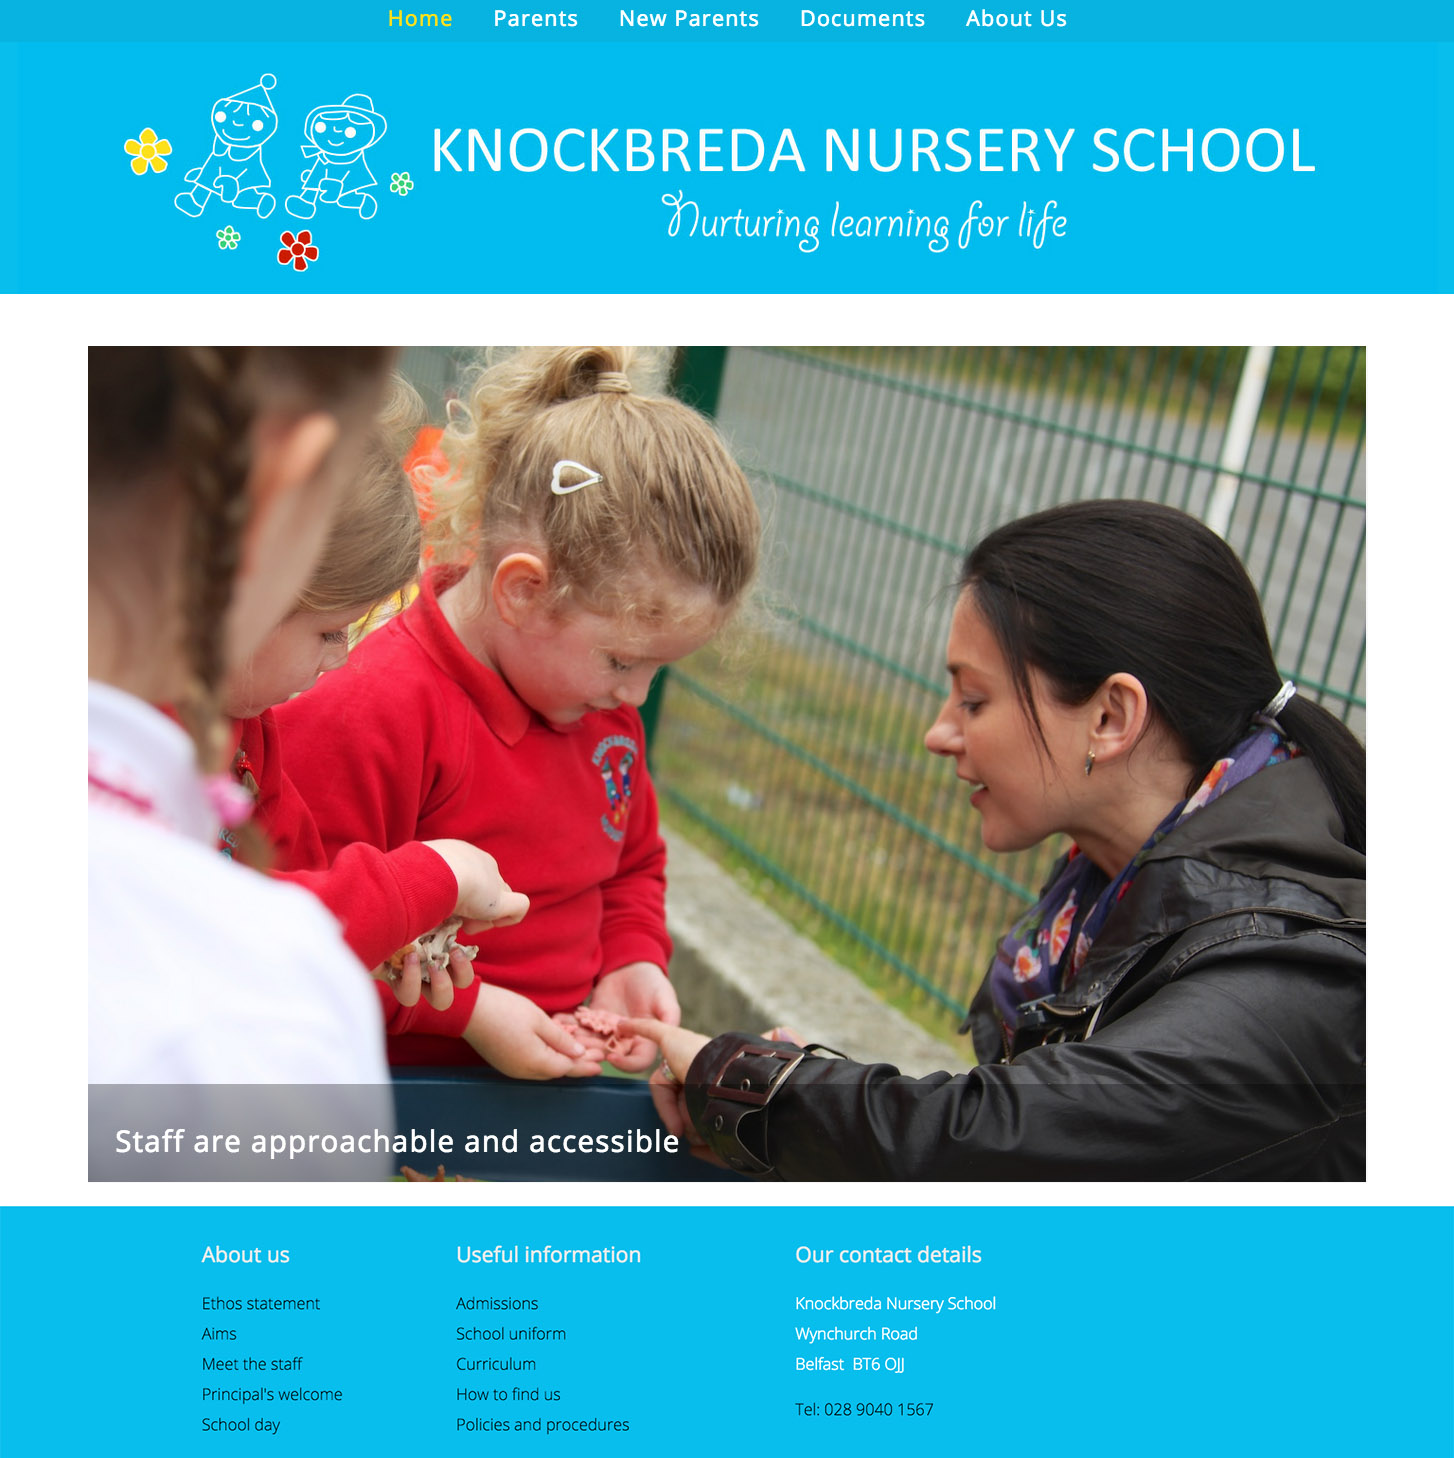 Knockbreda Nursery School New Website 2015